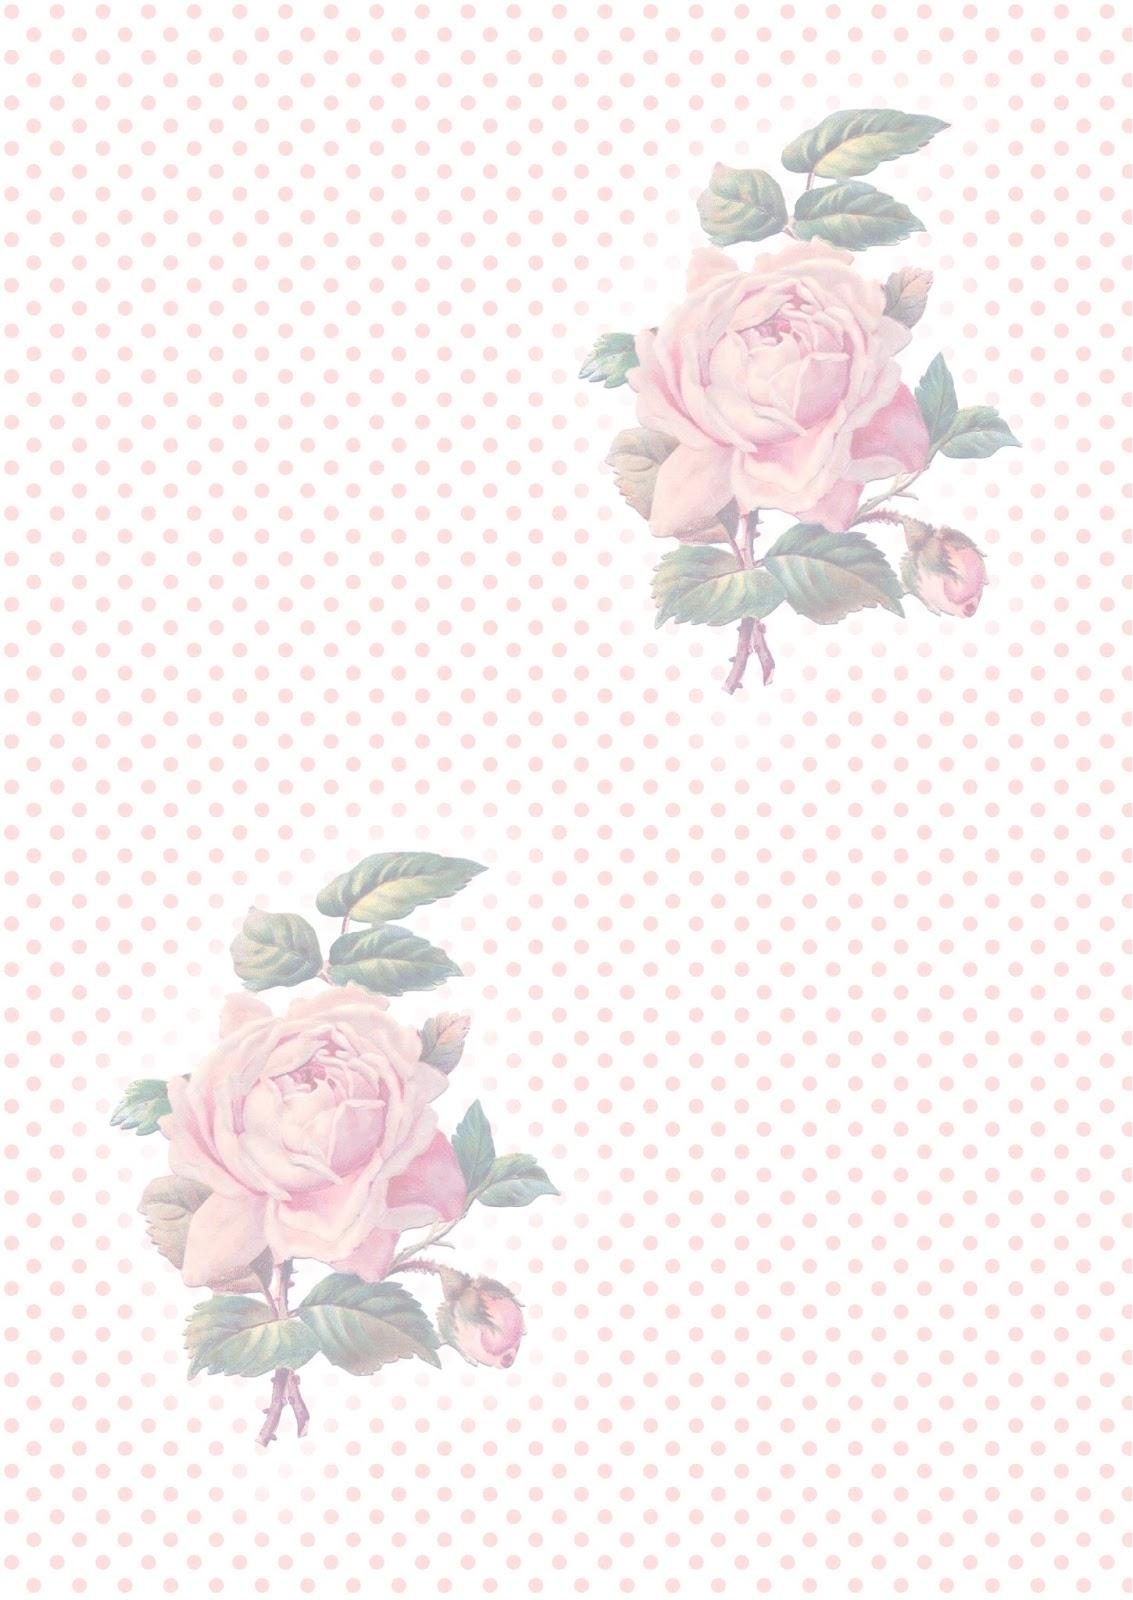 Free printable vintage rose papers - ausdruckbares Geschenkpapier ...